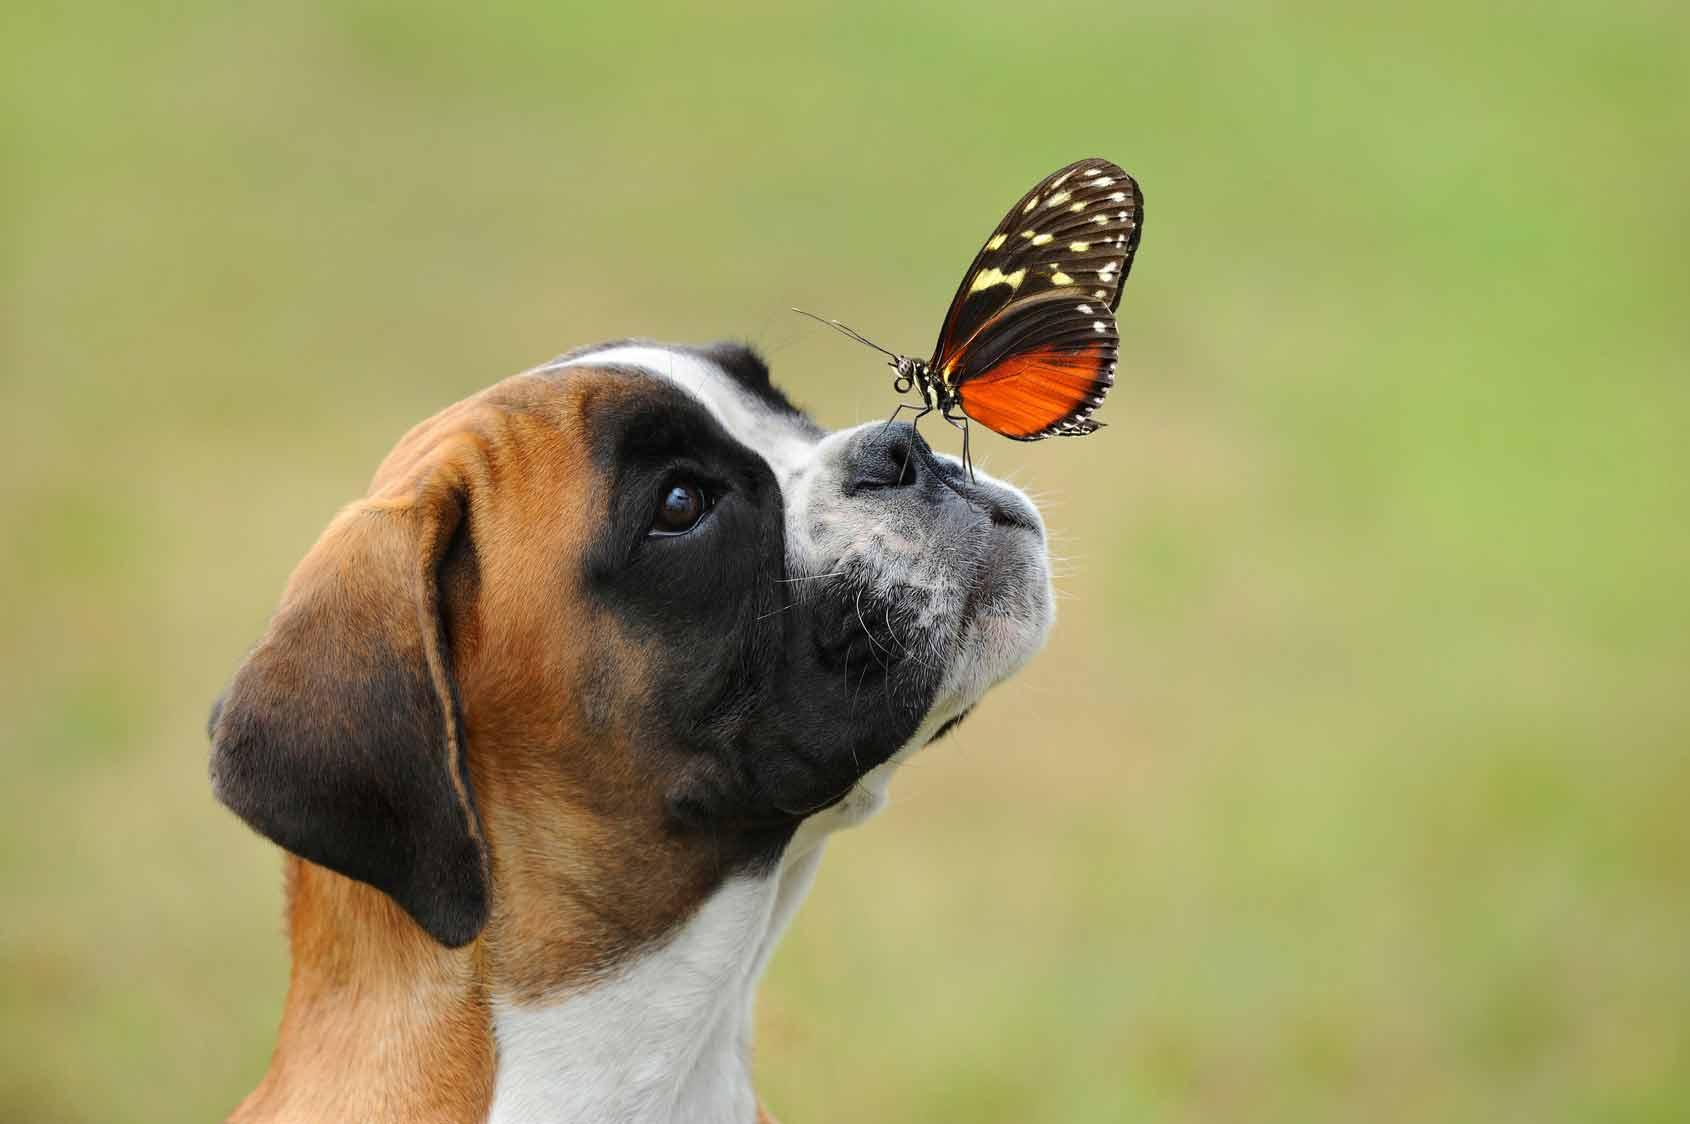 Puntura vespa cane